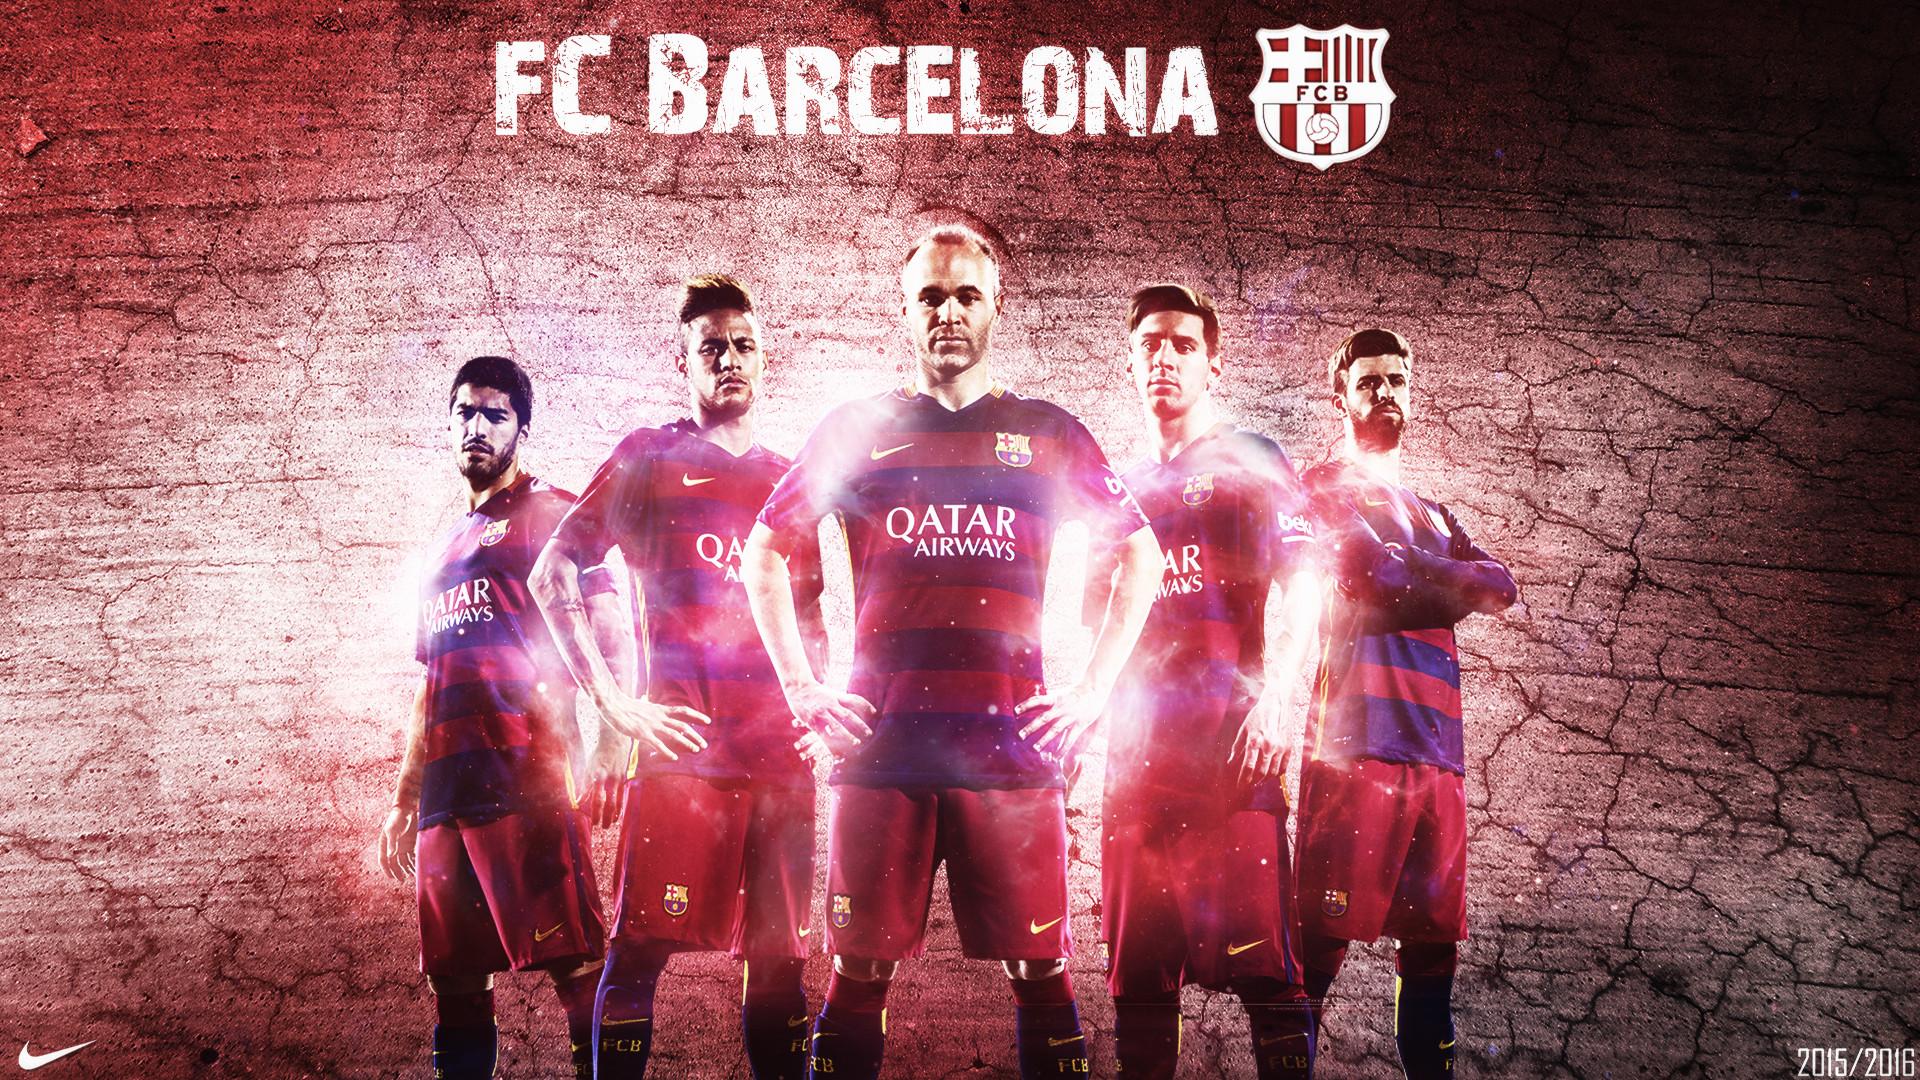 fc barcelona team wallpaper 2016 – Google Search